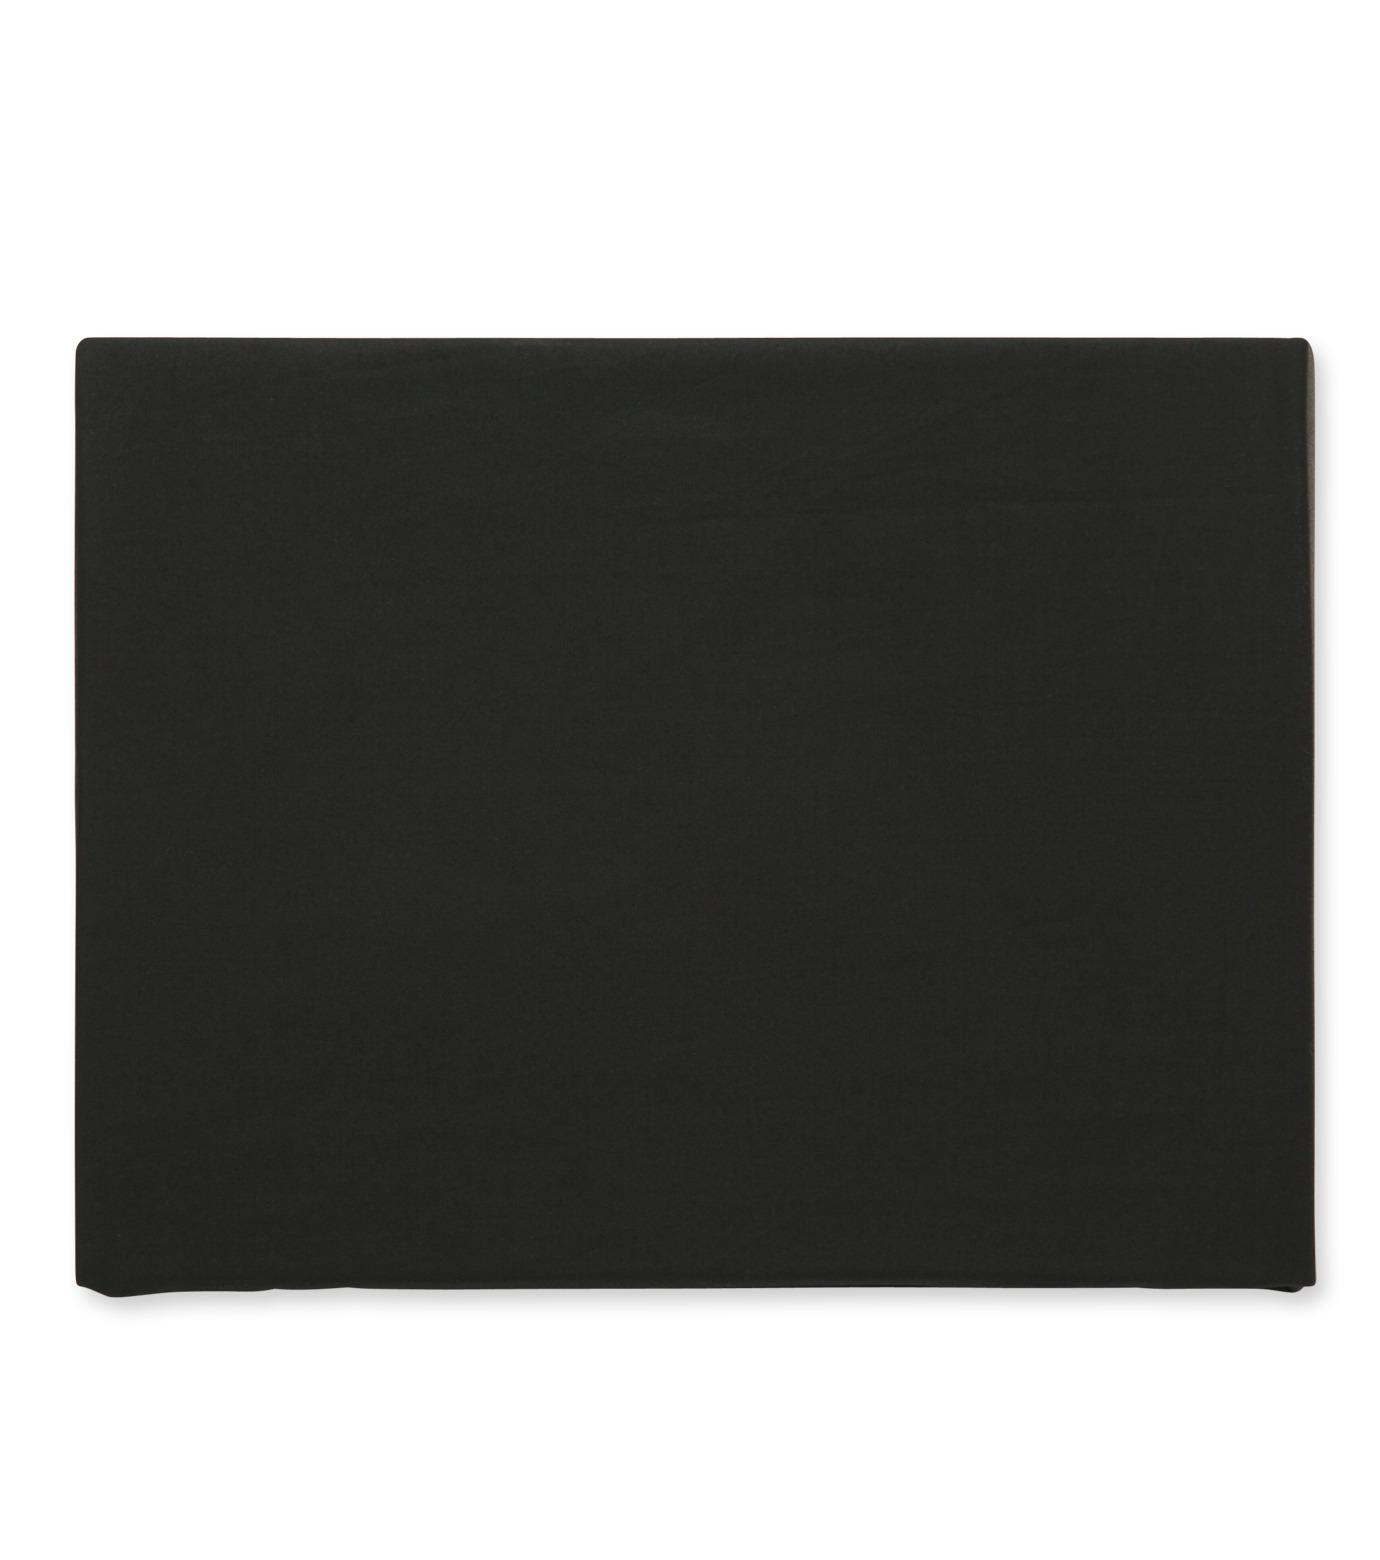 HEY YOU !(ヘイユウ)のDuvet cover/queen-BLACK(インテリア/interior)-duvetcover-Q-13 拡大詳細画像1